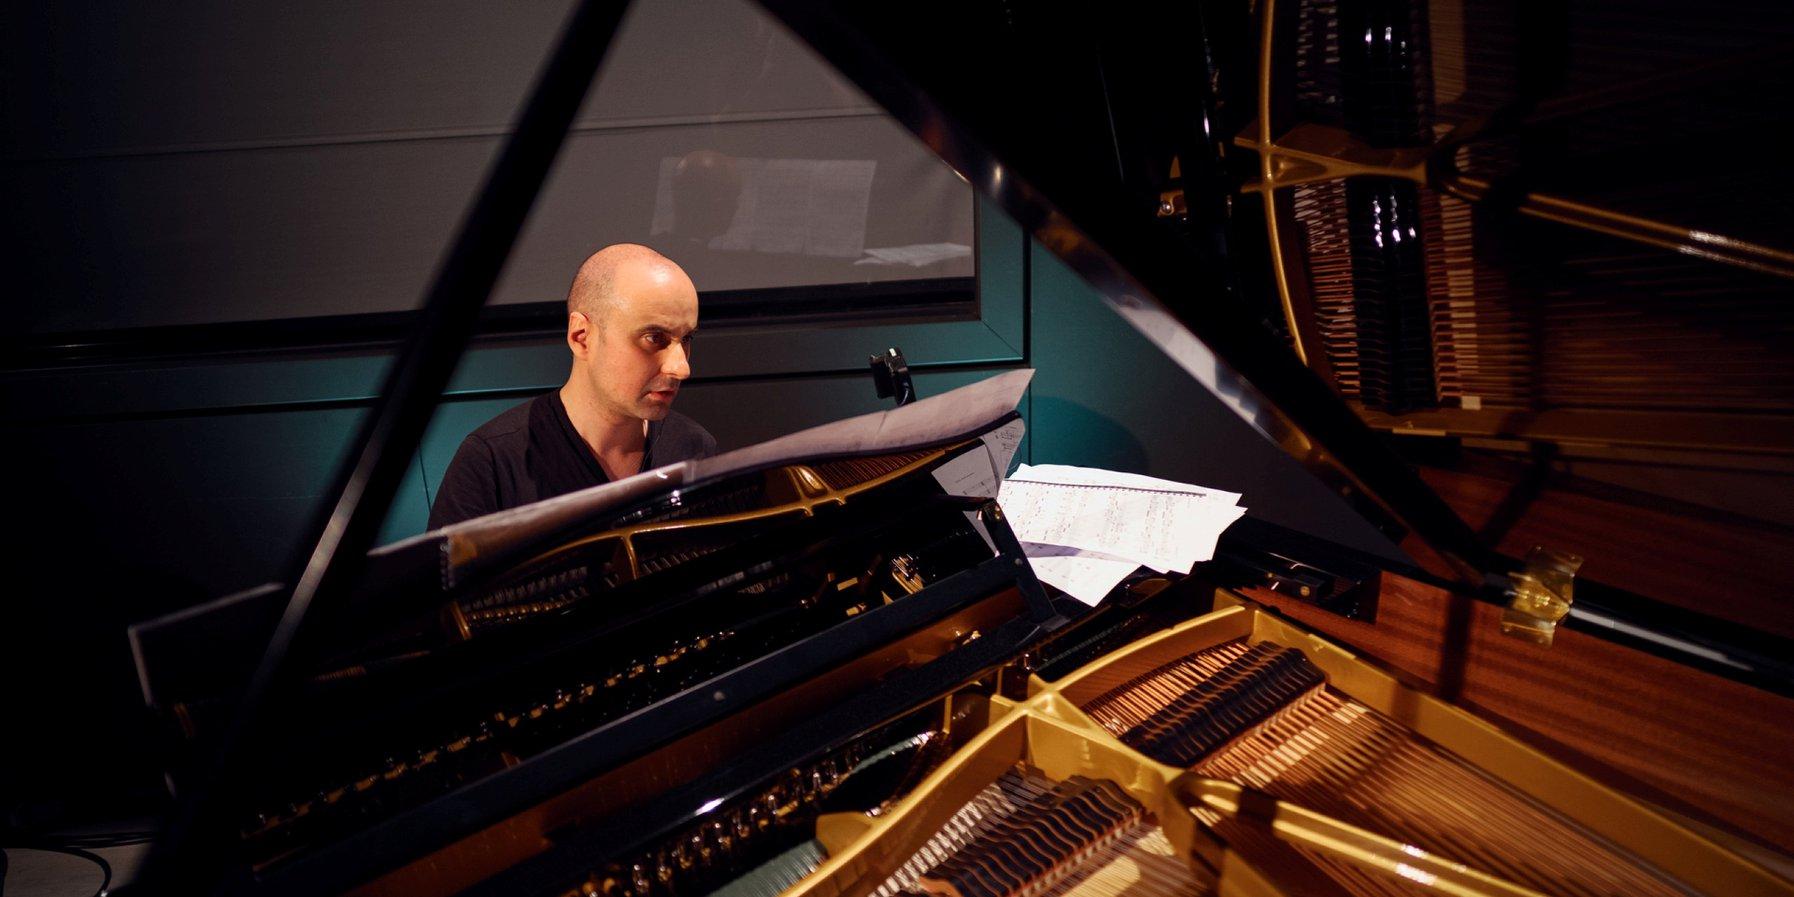 On the piano: Andrej Koroliov